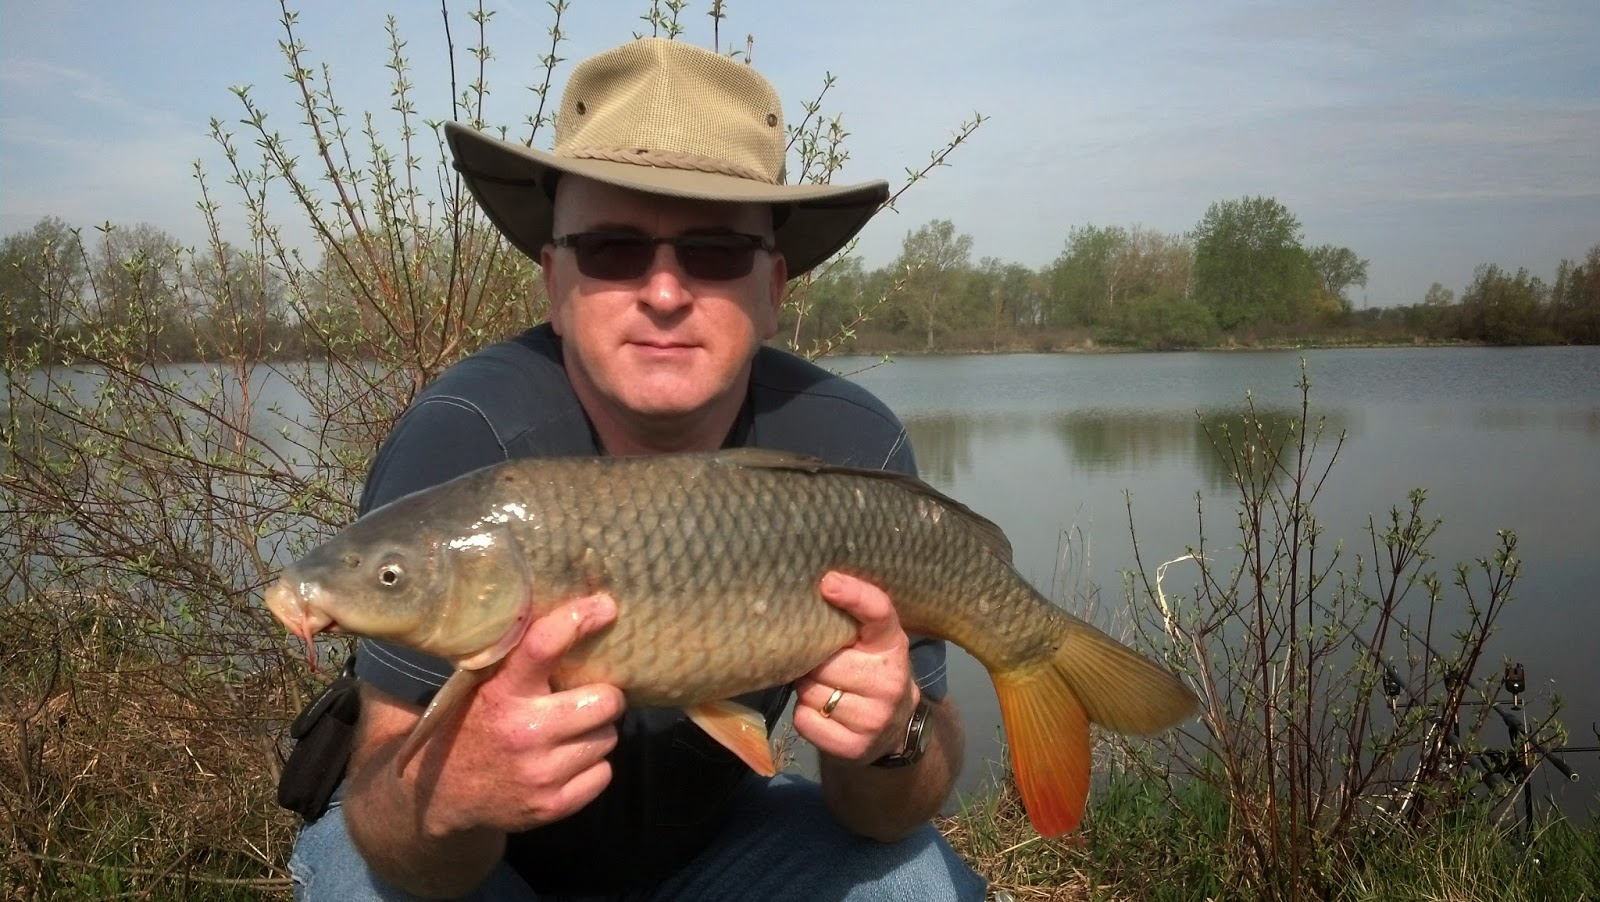 Michigan carp fishing blog april 2015 for Can you eat carp fish